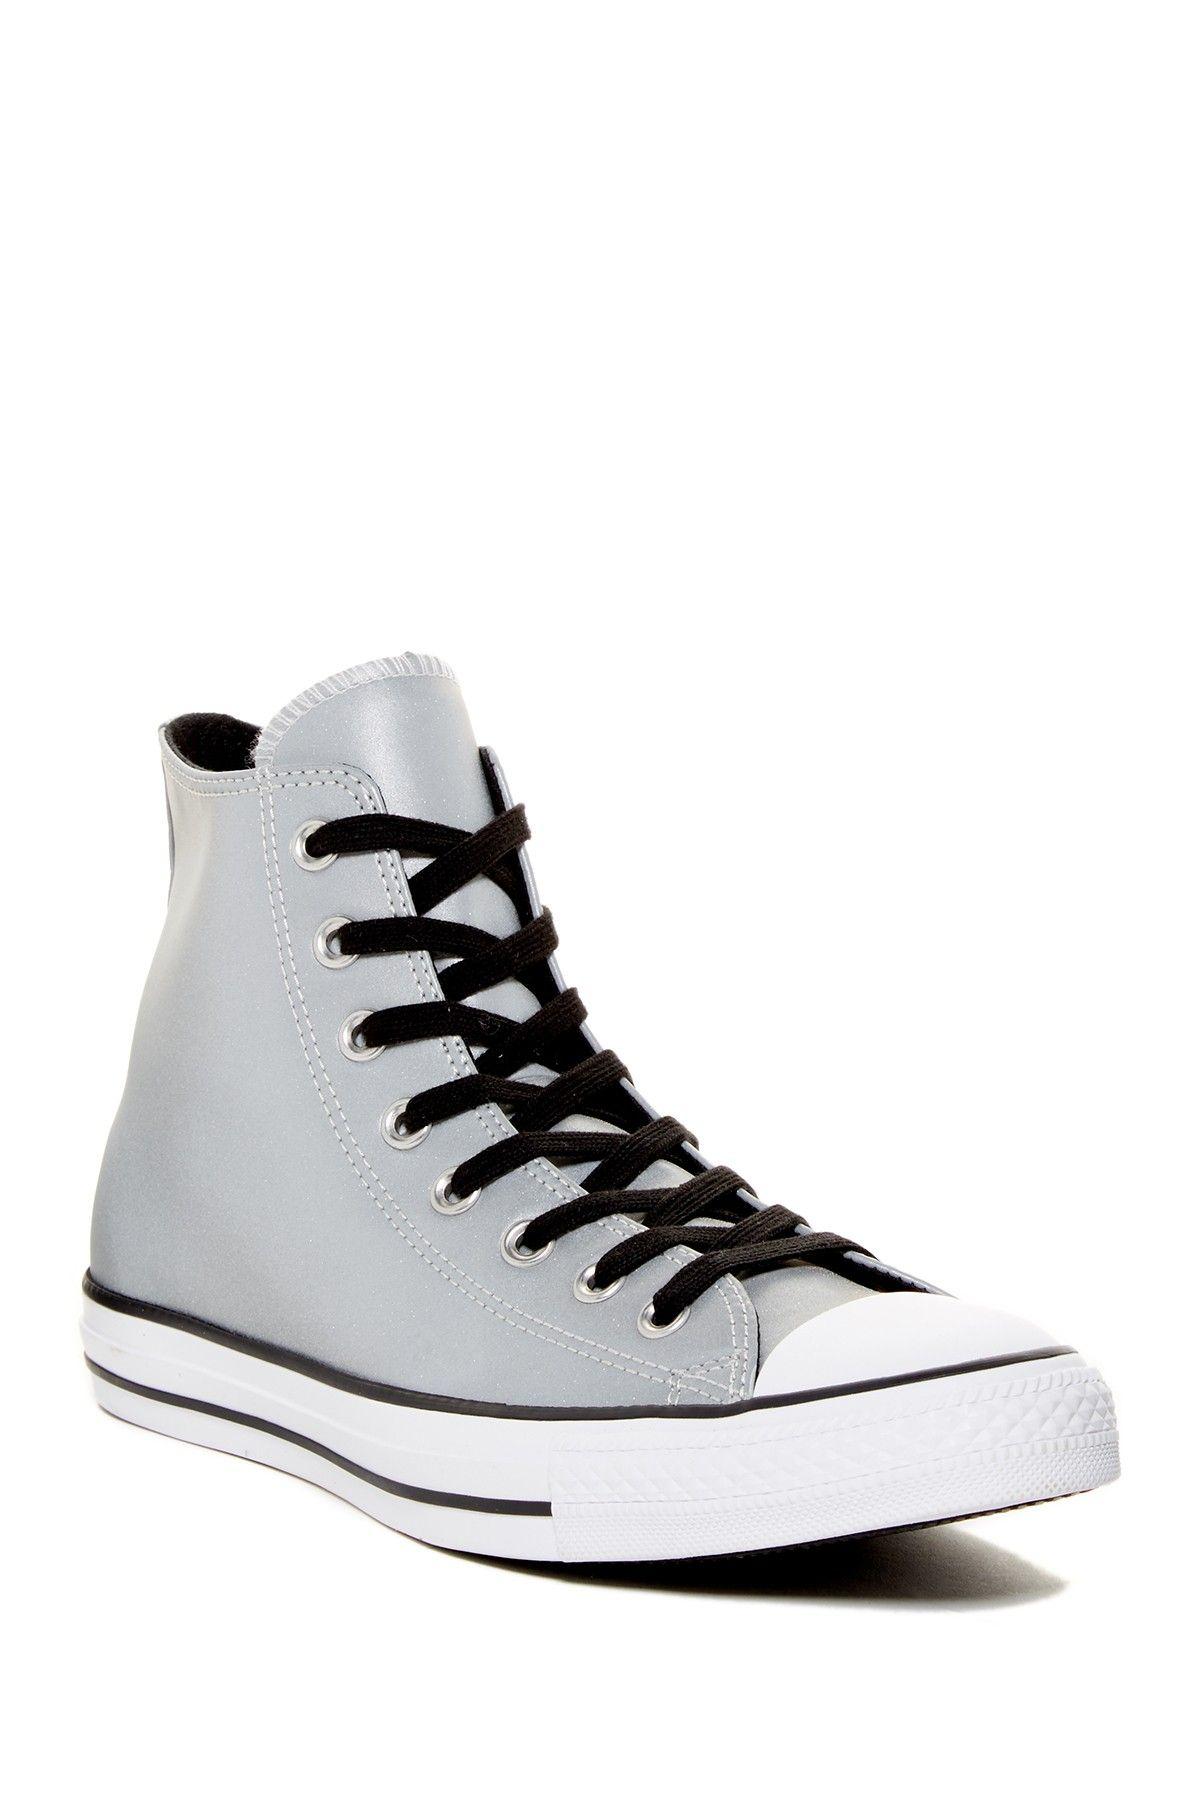 Chuck Taylor All Star Reflective High Top Sneaker (Unisex)